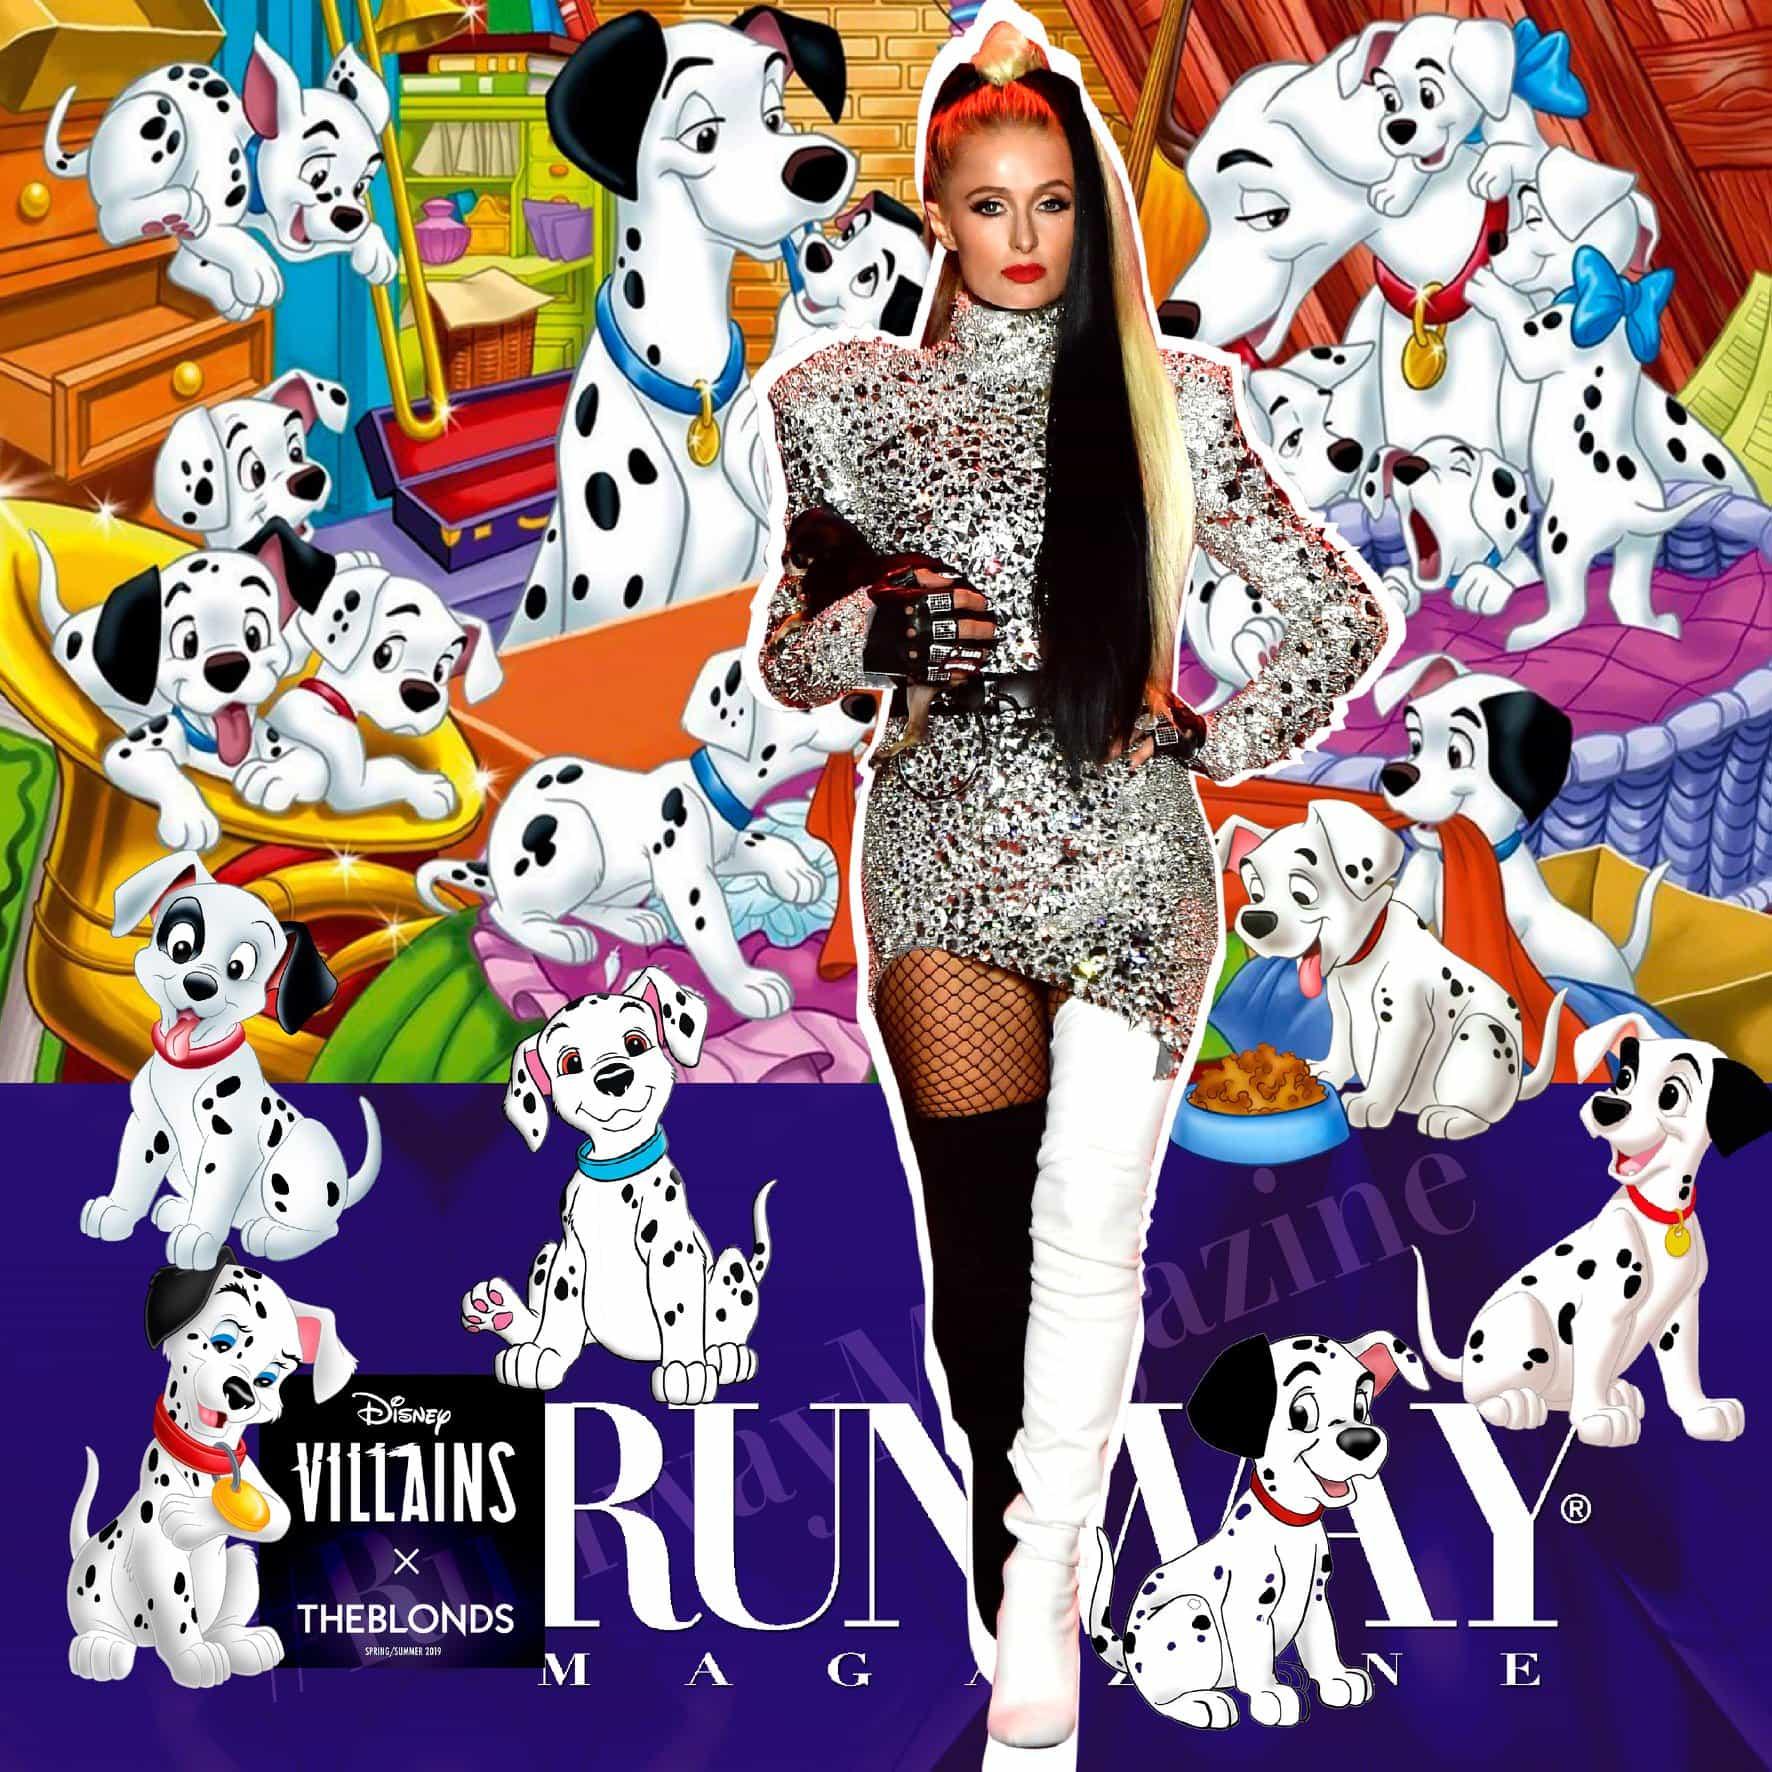 Paris Hilton Primavera-Estate 2019 Disney Villains x The Blonds New York di RUNWAY MAGAZINE